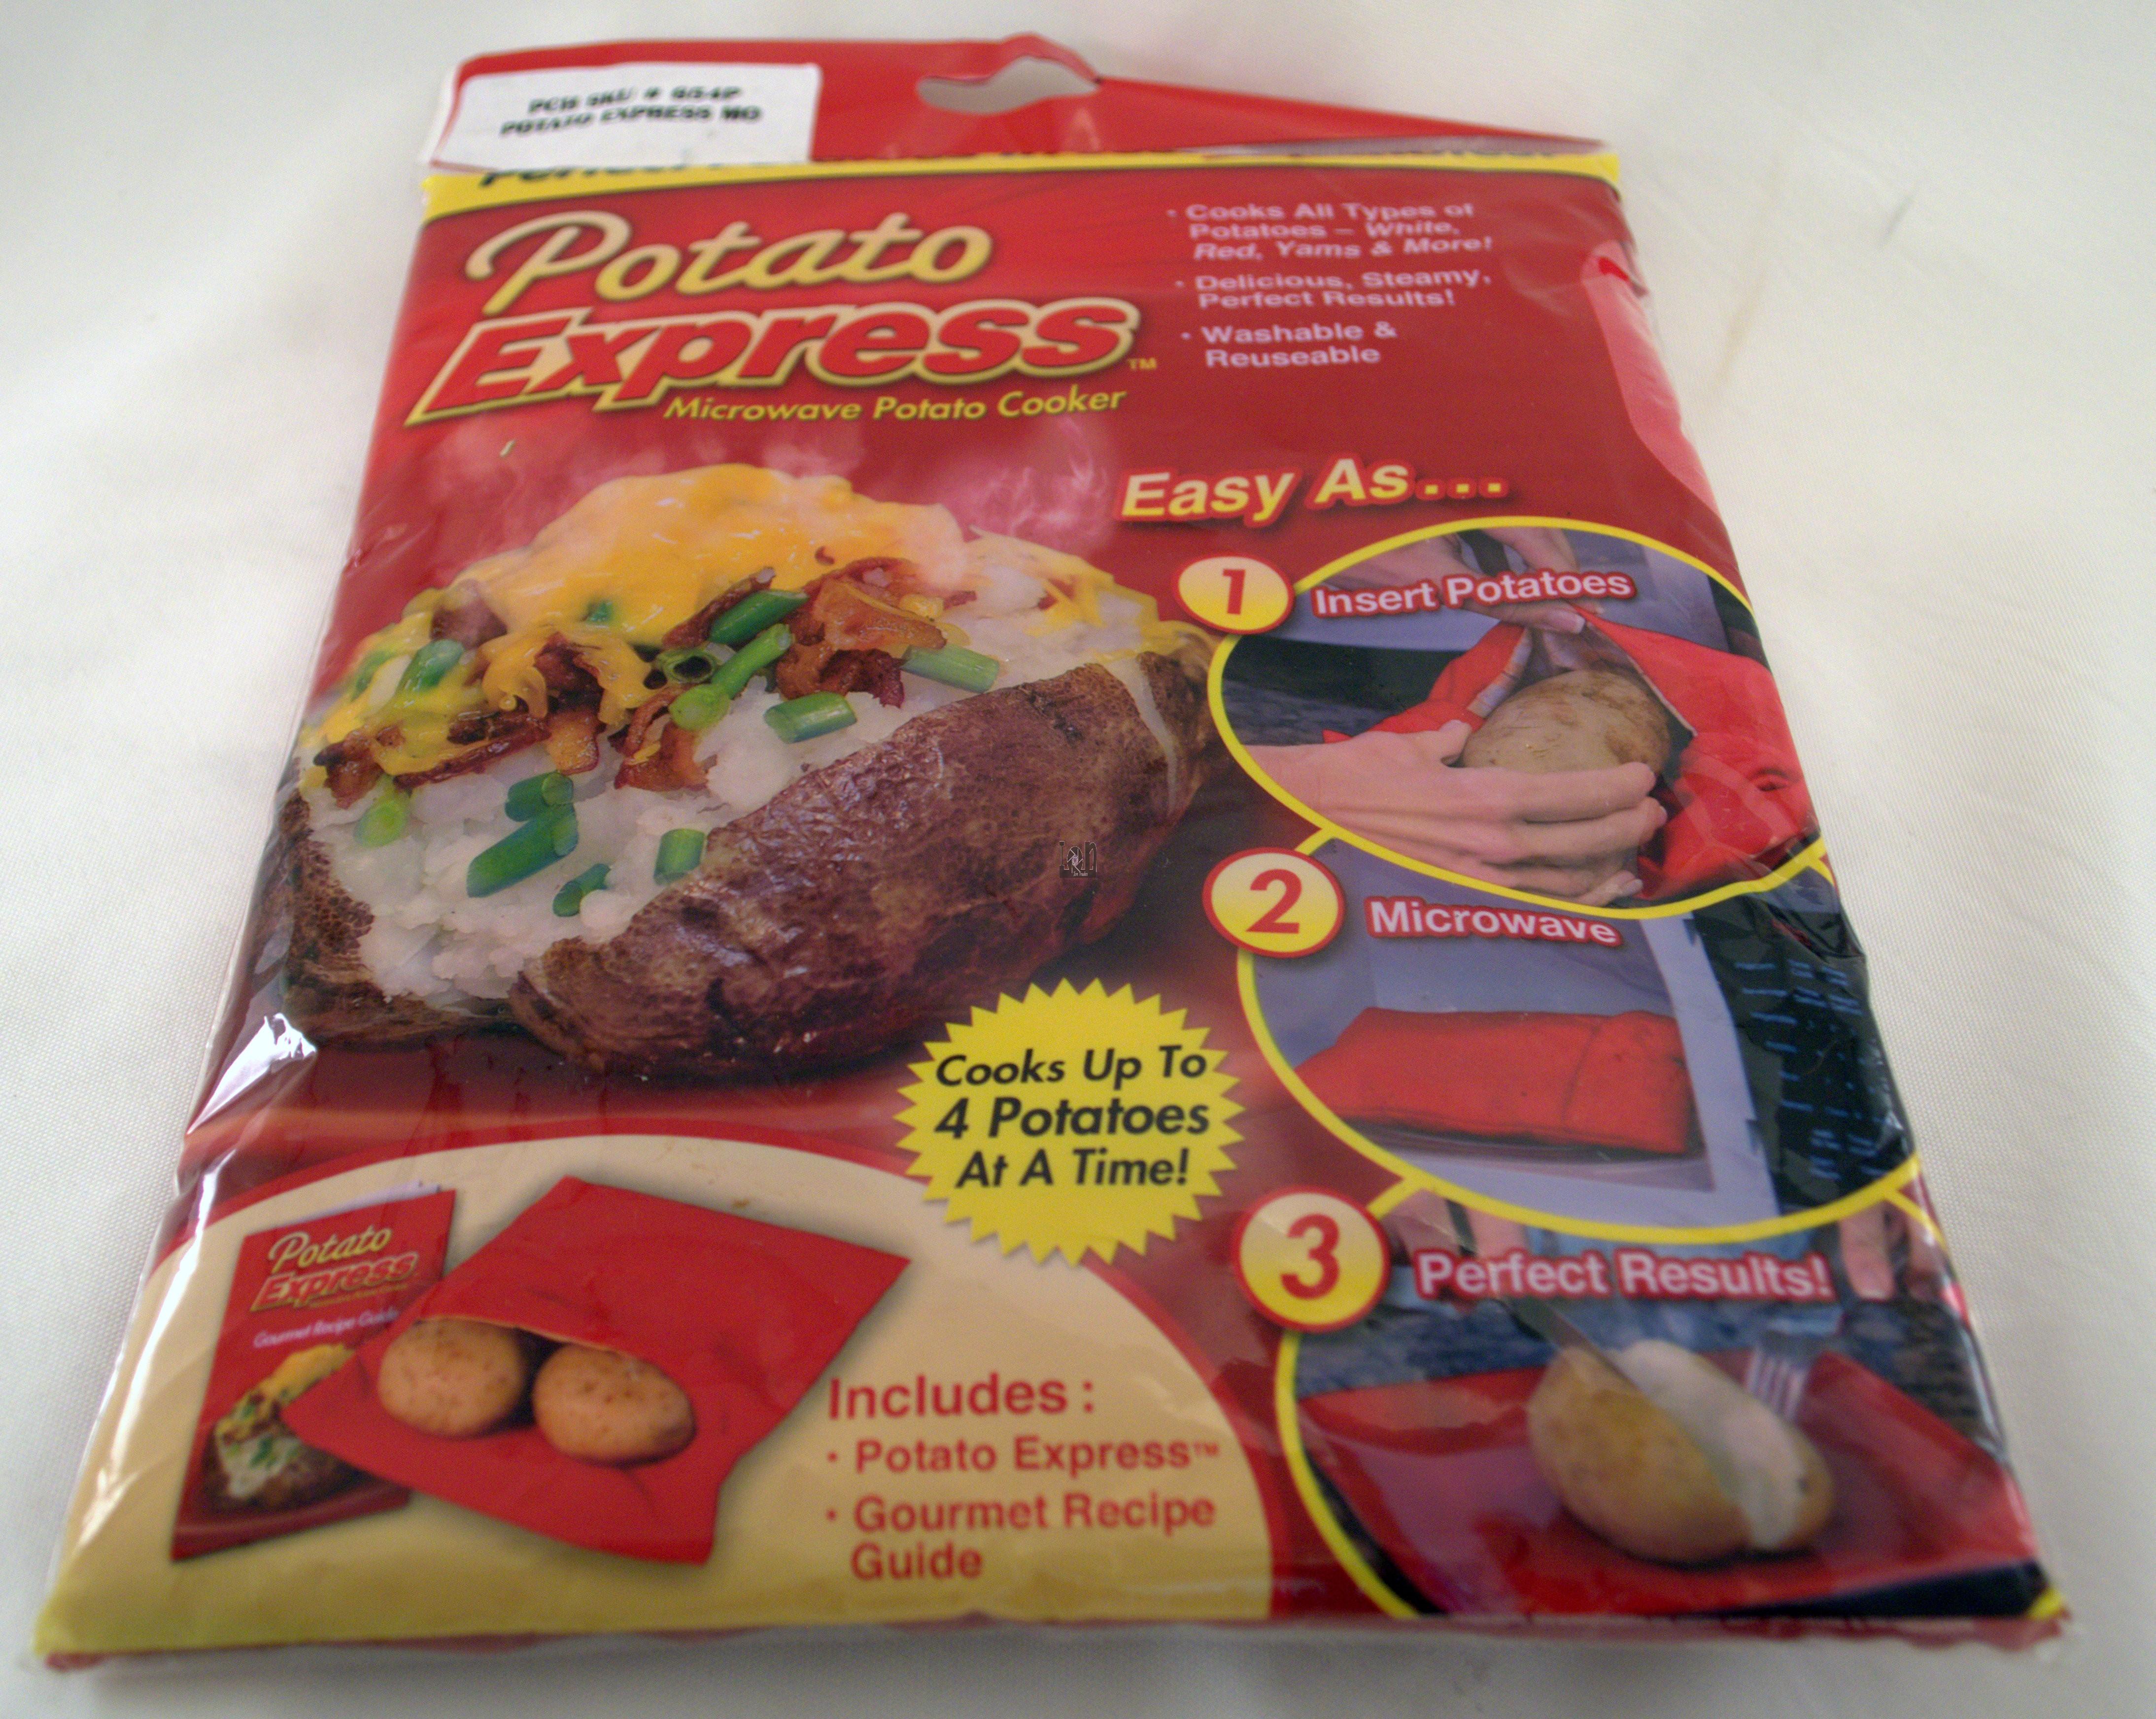 Potato Express Microwave Potato Cooker Baked